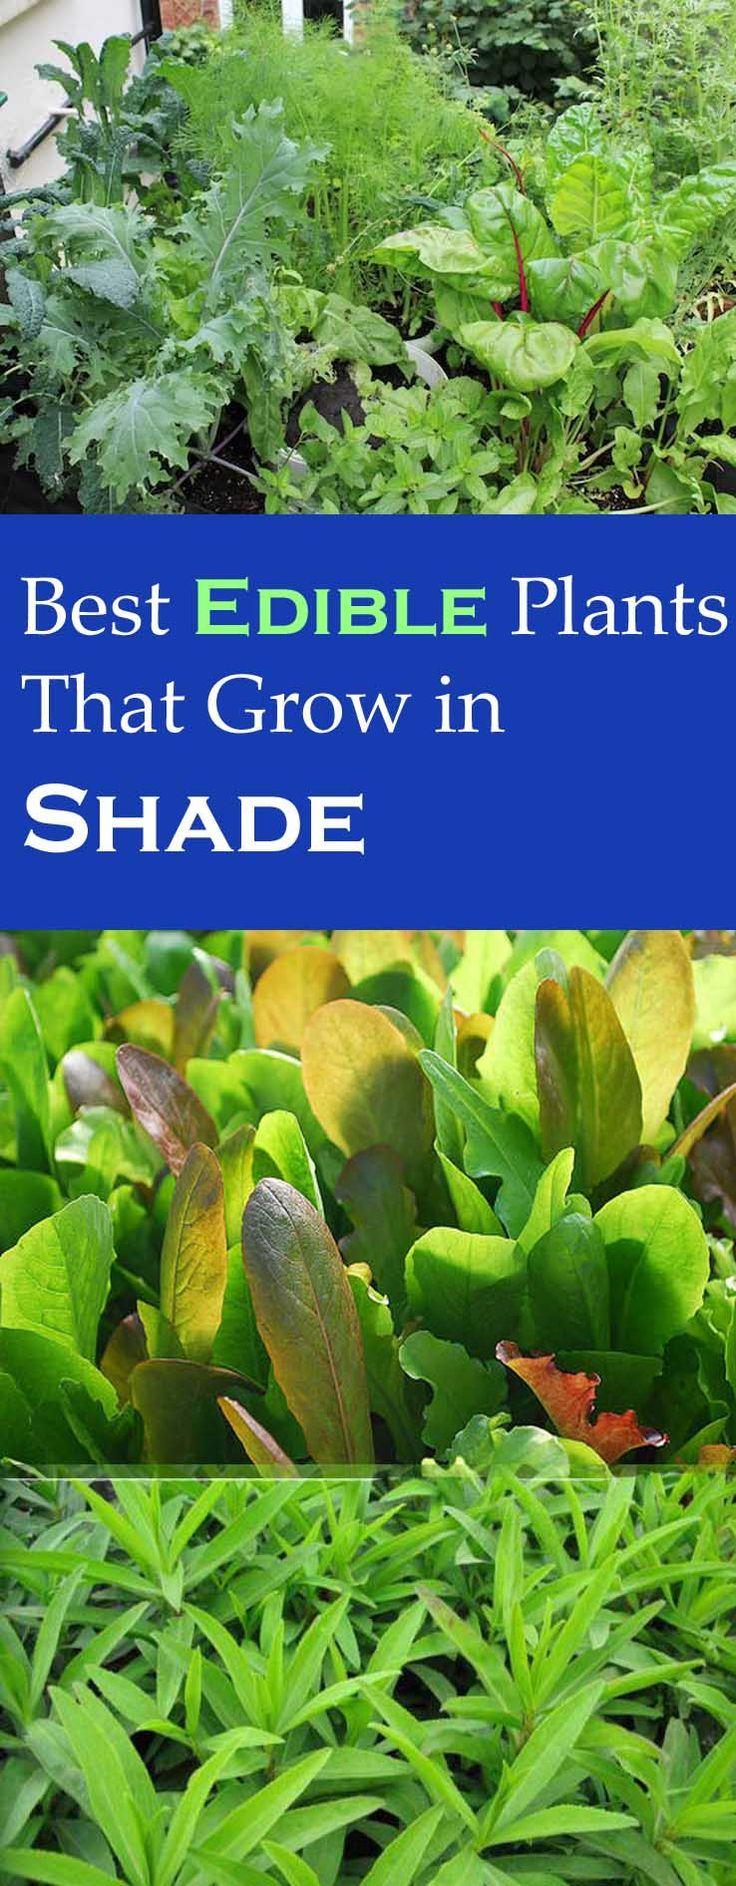 Edible Plants That Grow In Shade Plants Indoor 400 x 300